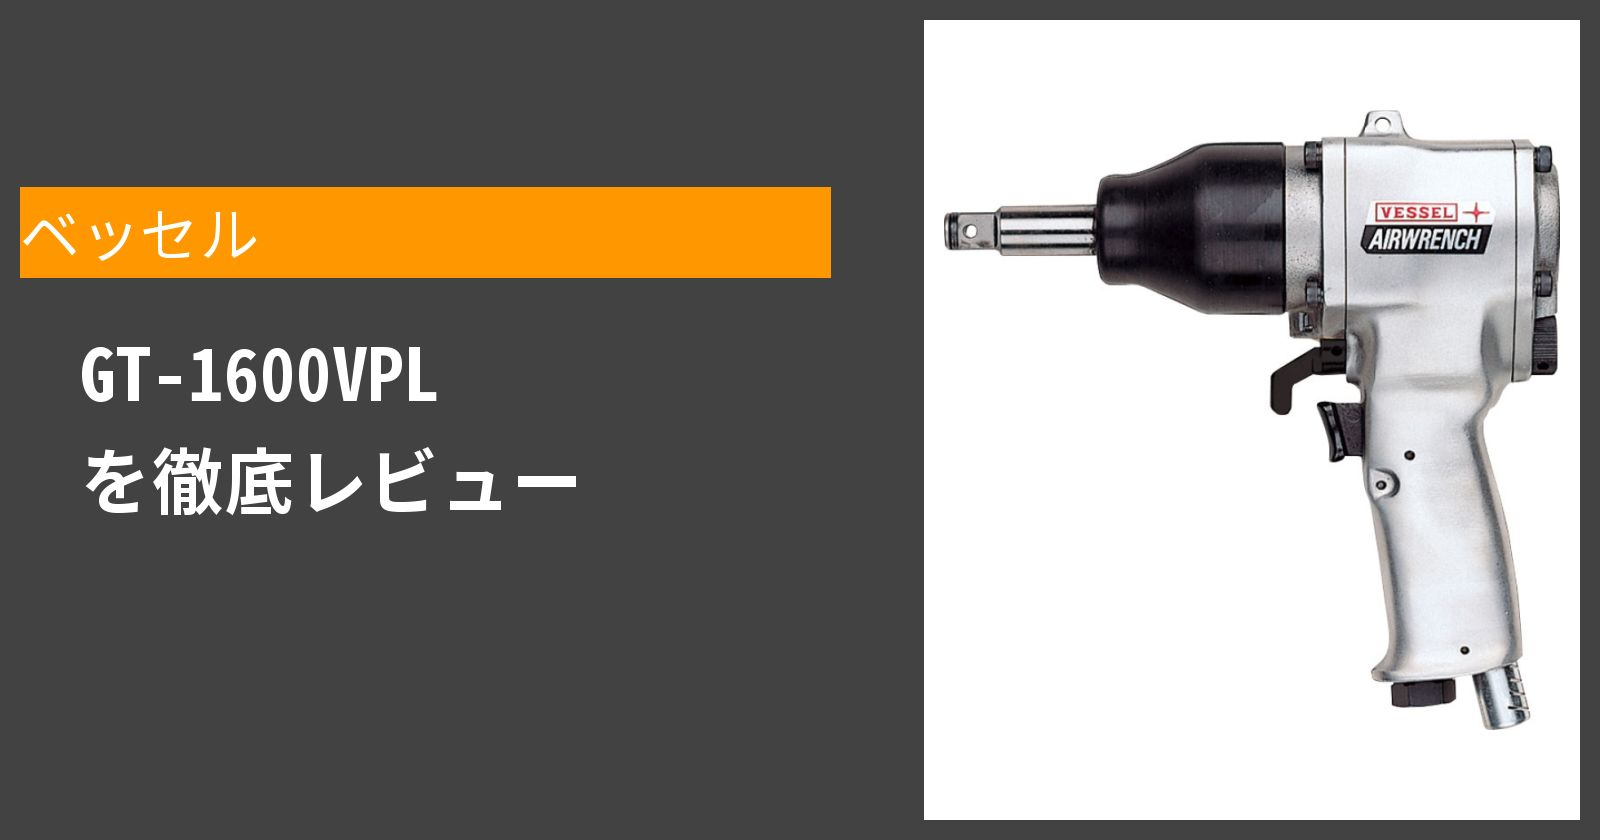 GT-1600VPLを徹底評価